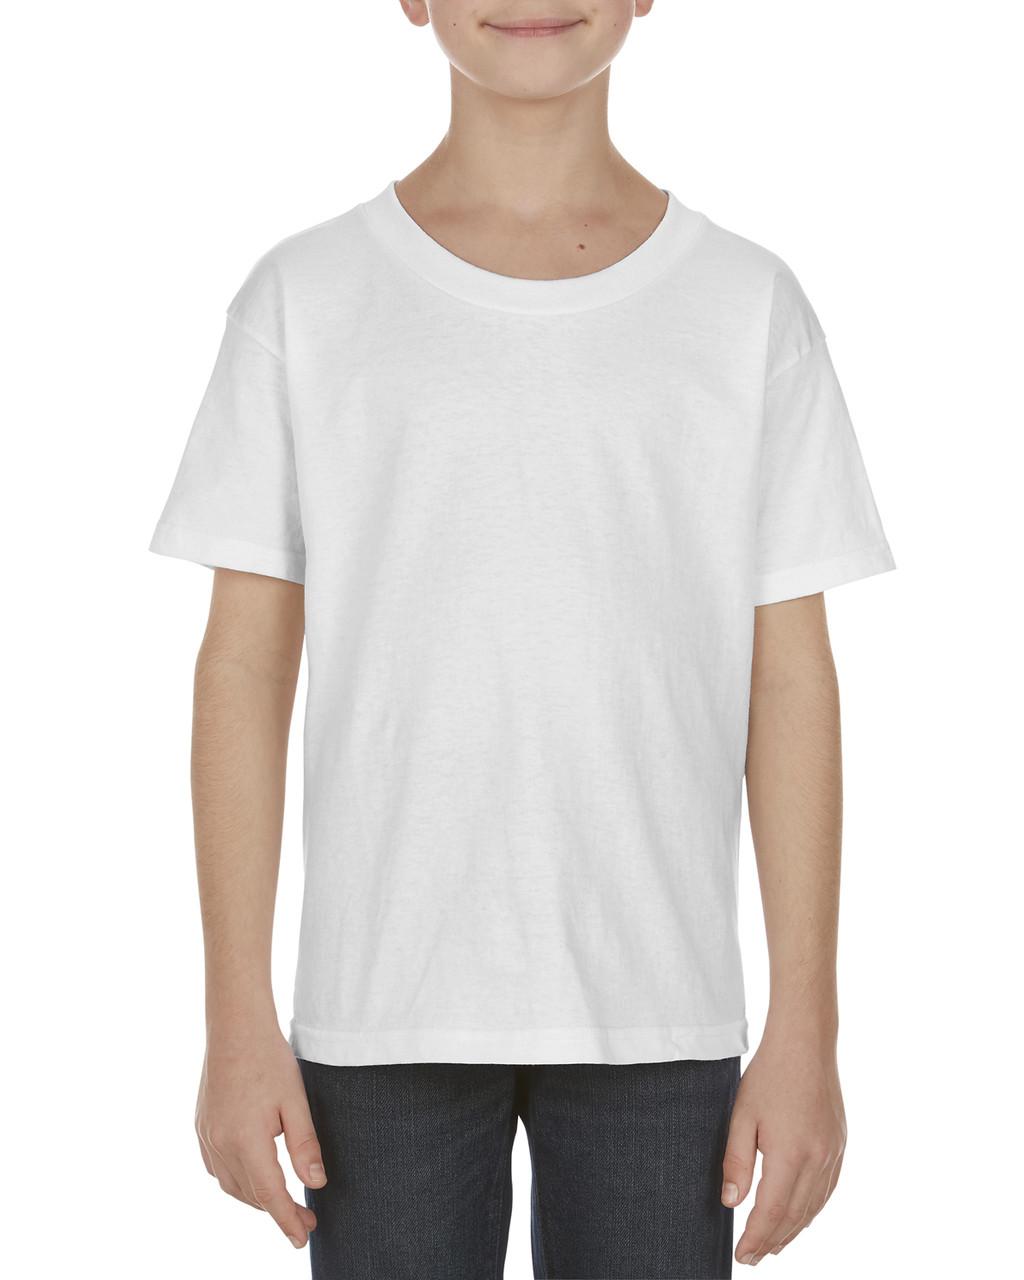 4223196c9164 Alstyle AL3981 Youth 5.1 oz., 100% Soft Spun Cotton T-Shirt -  ClothingAuthority.com